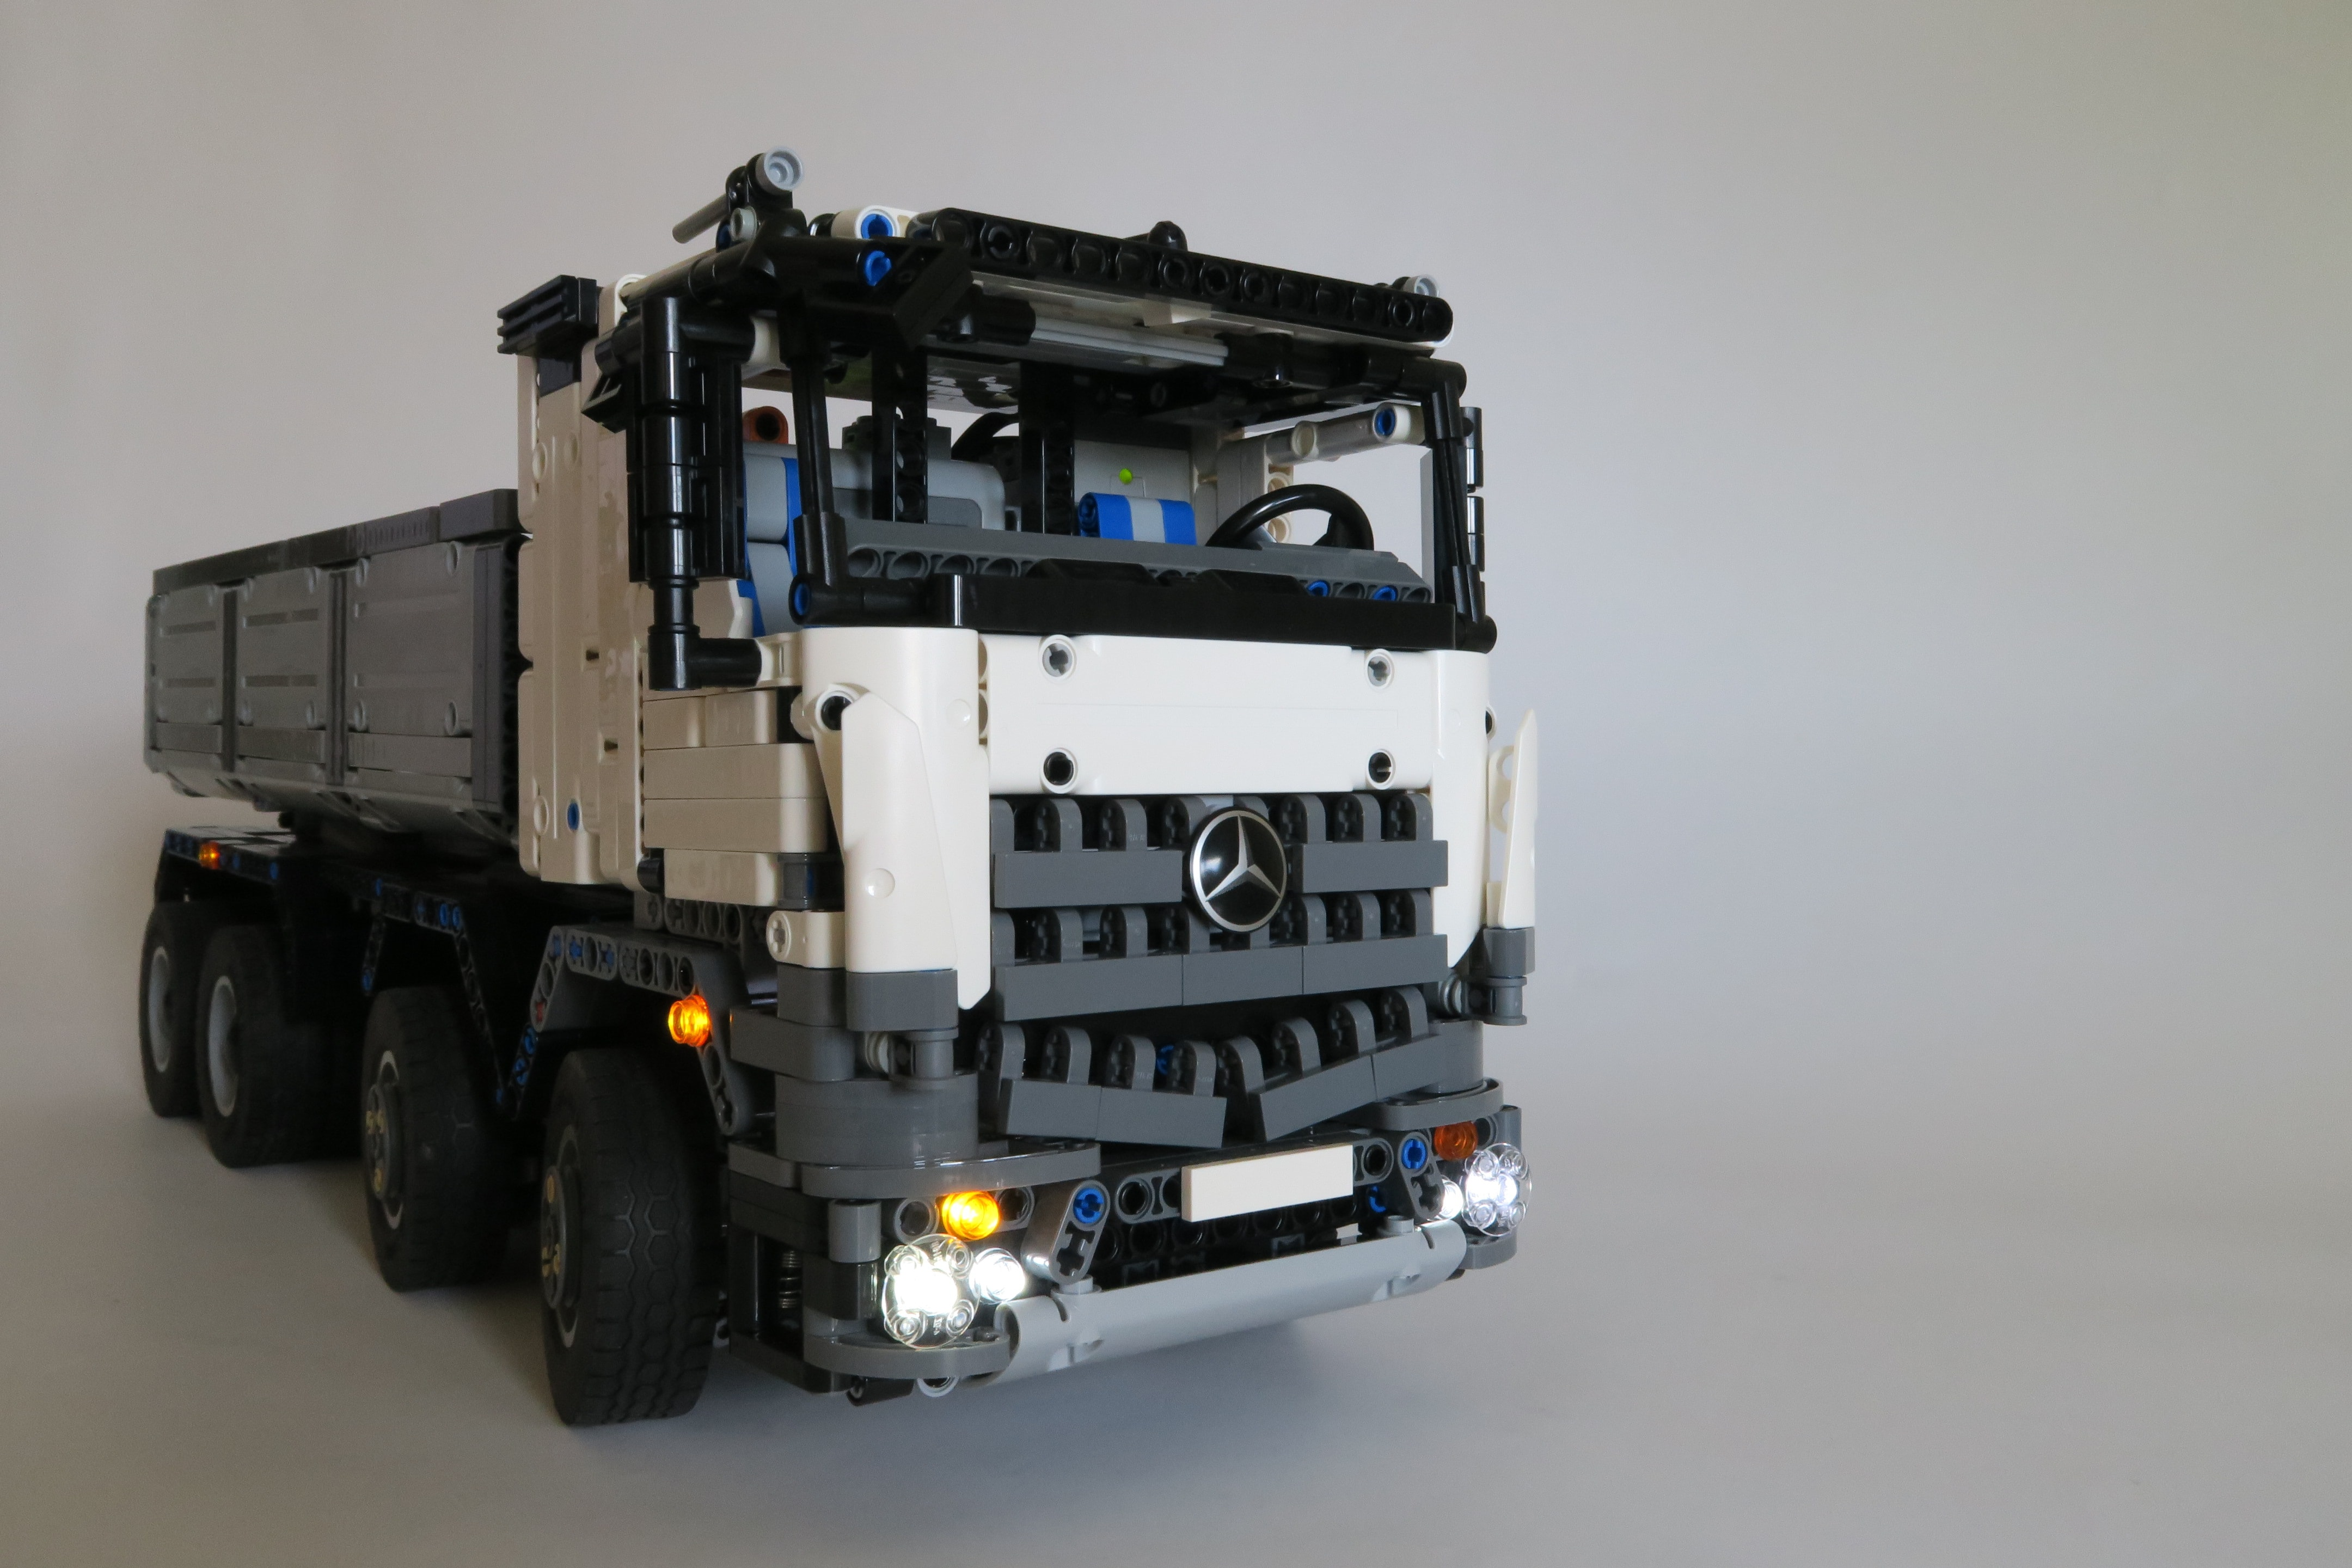 Mercedes Arocs dump truck